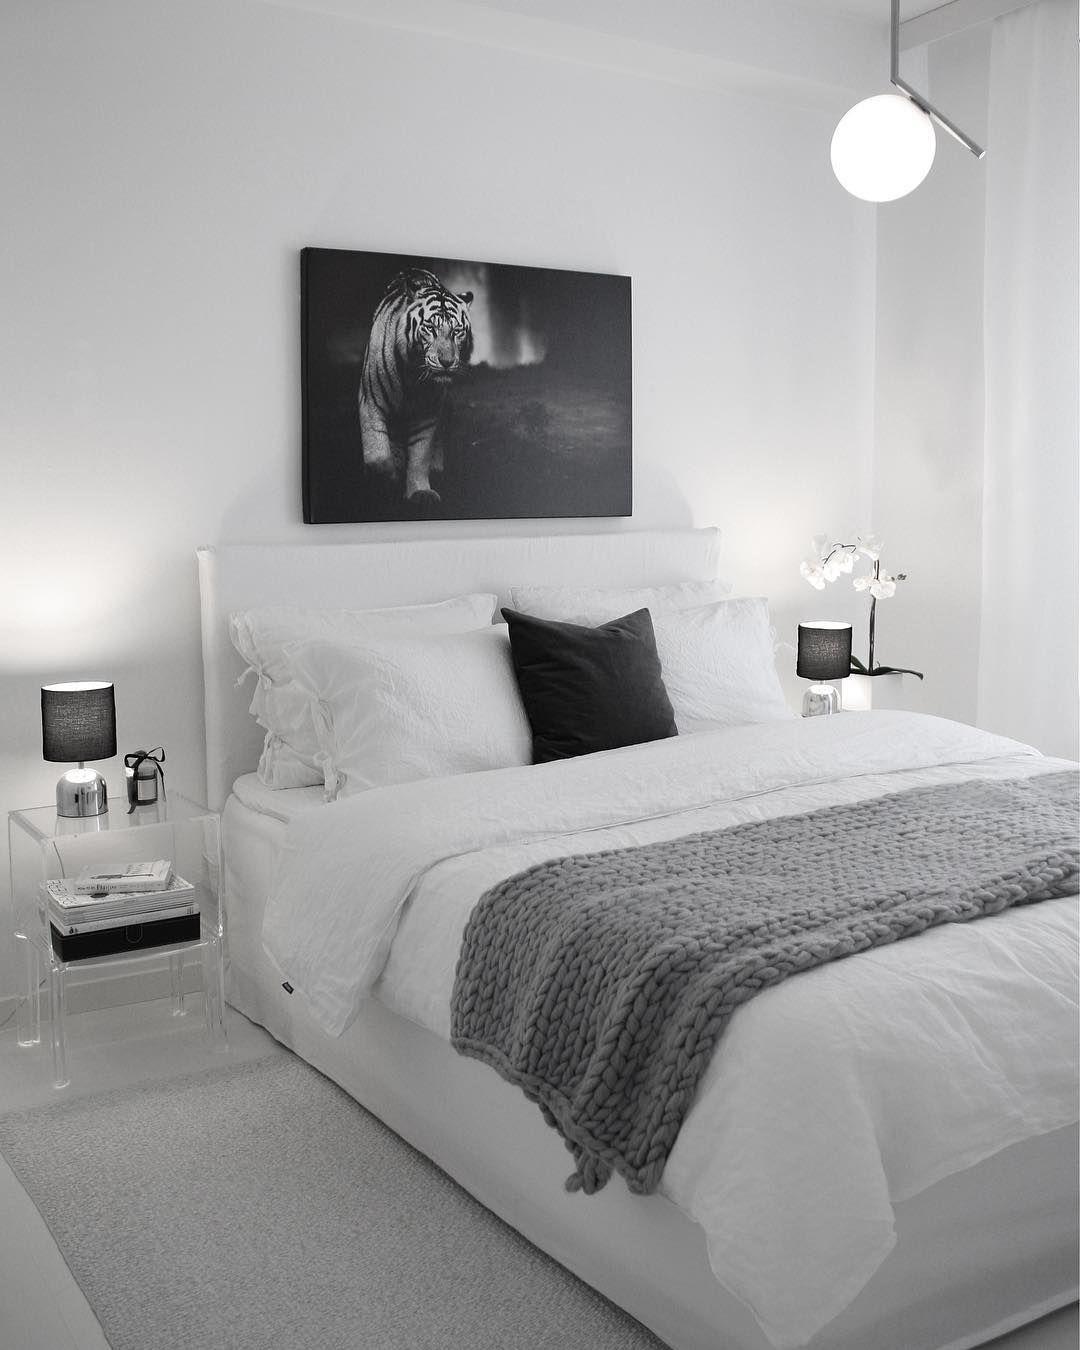 grey and white room on black white bedroom aesthetic bedroom gray bedroom walls grey girls rooms bedroom gray bedroom walls